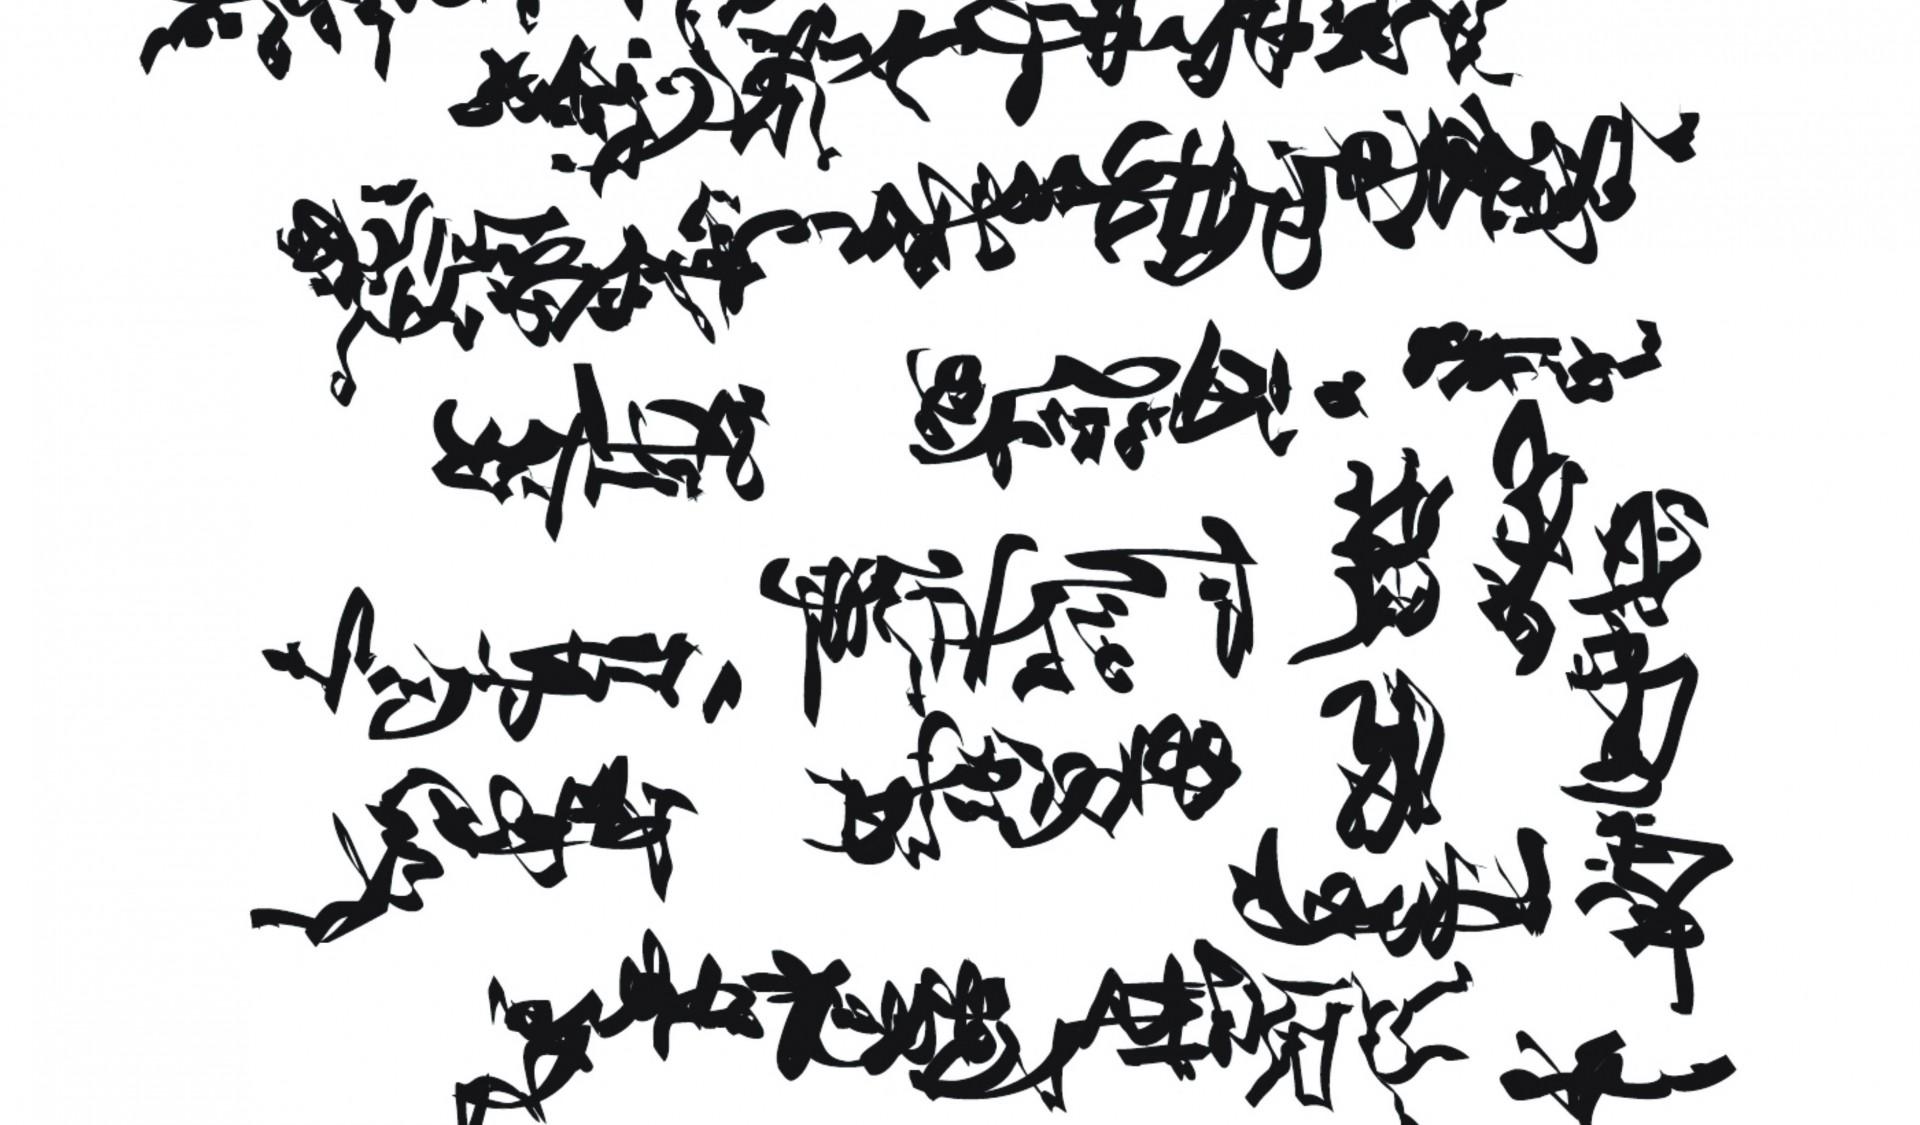 Ausschnitt: Palimpsest 001, Eco-Solvent Tinte auf LKW-Plane, 137 x 205 cm, 2017